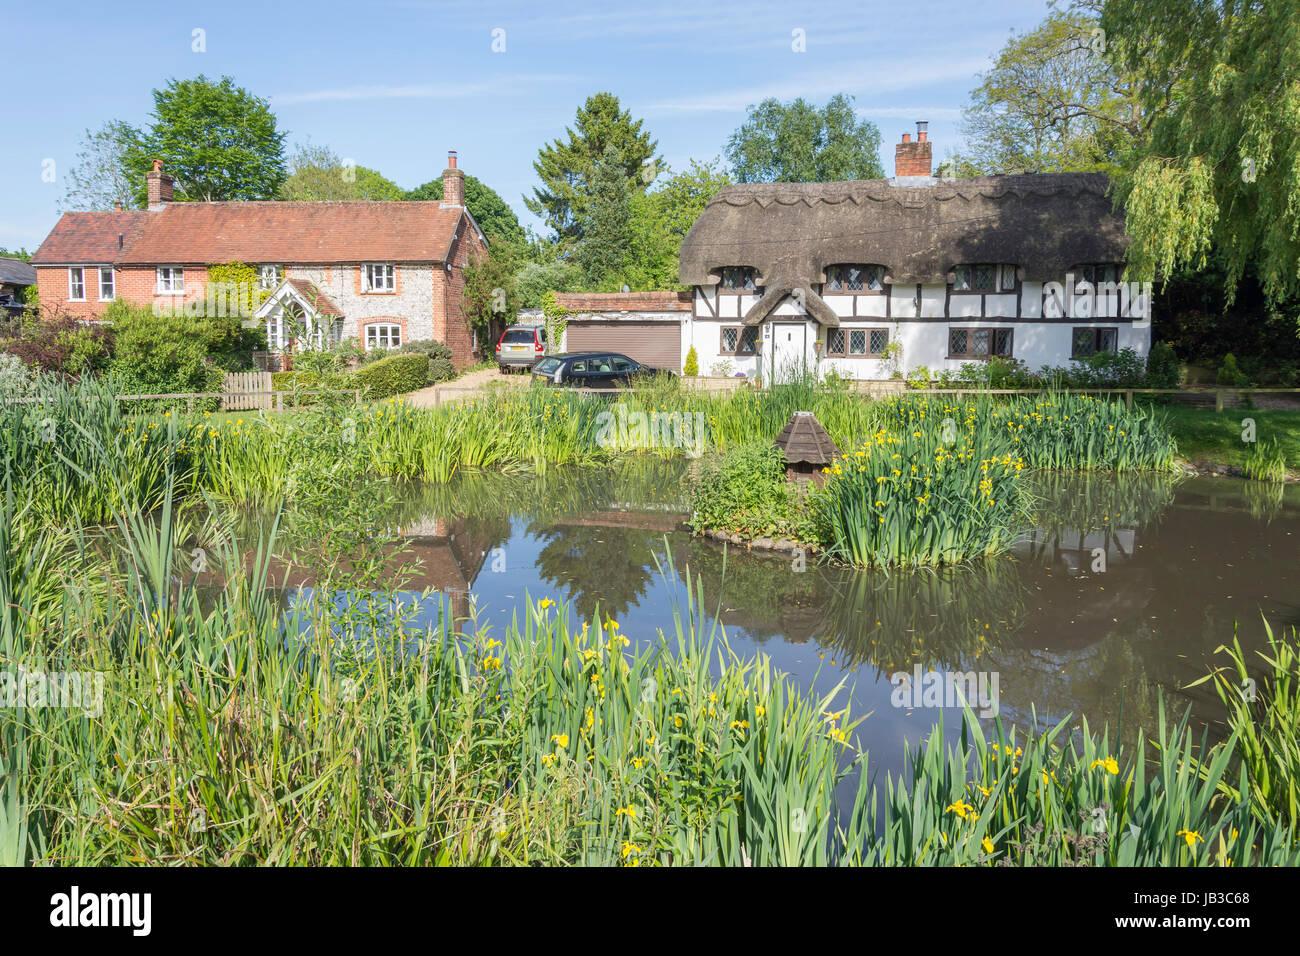 The Duck Pond, Oakley, Hampshire, England, United Kingdom - Stock Image